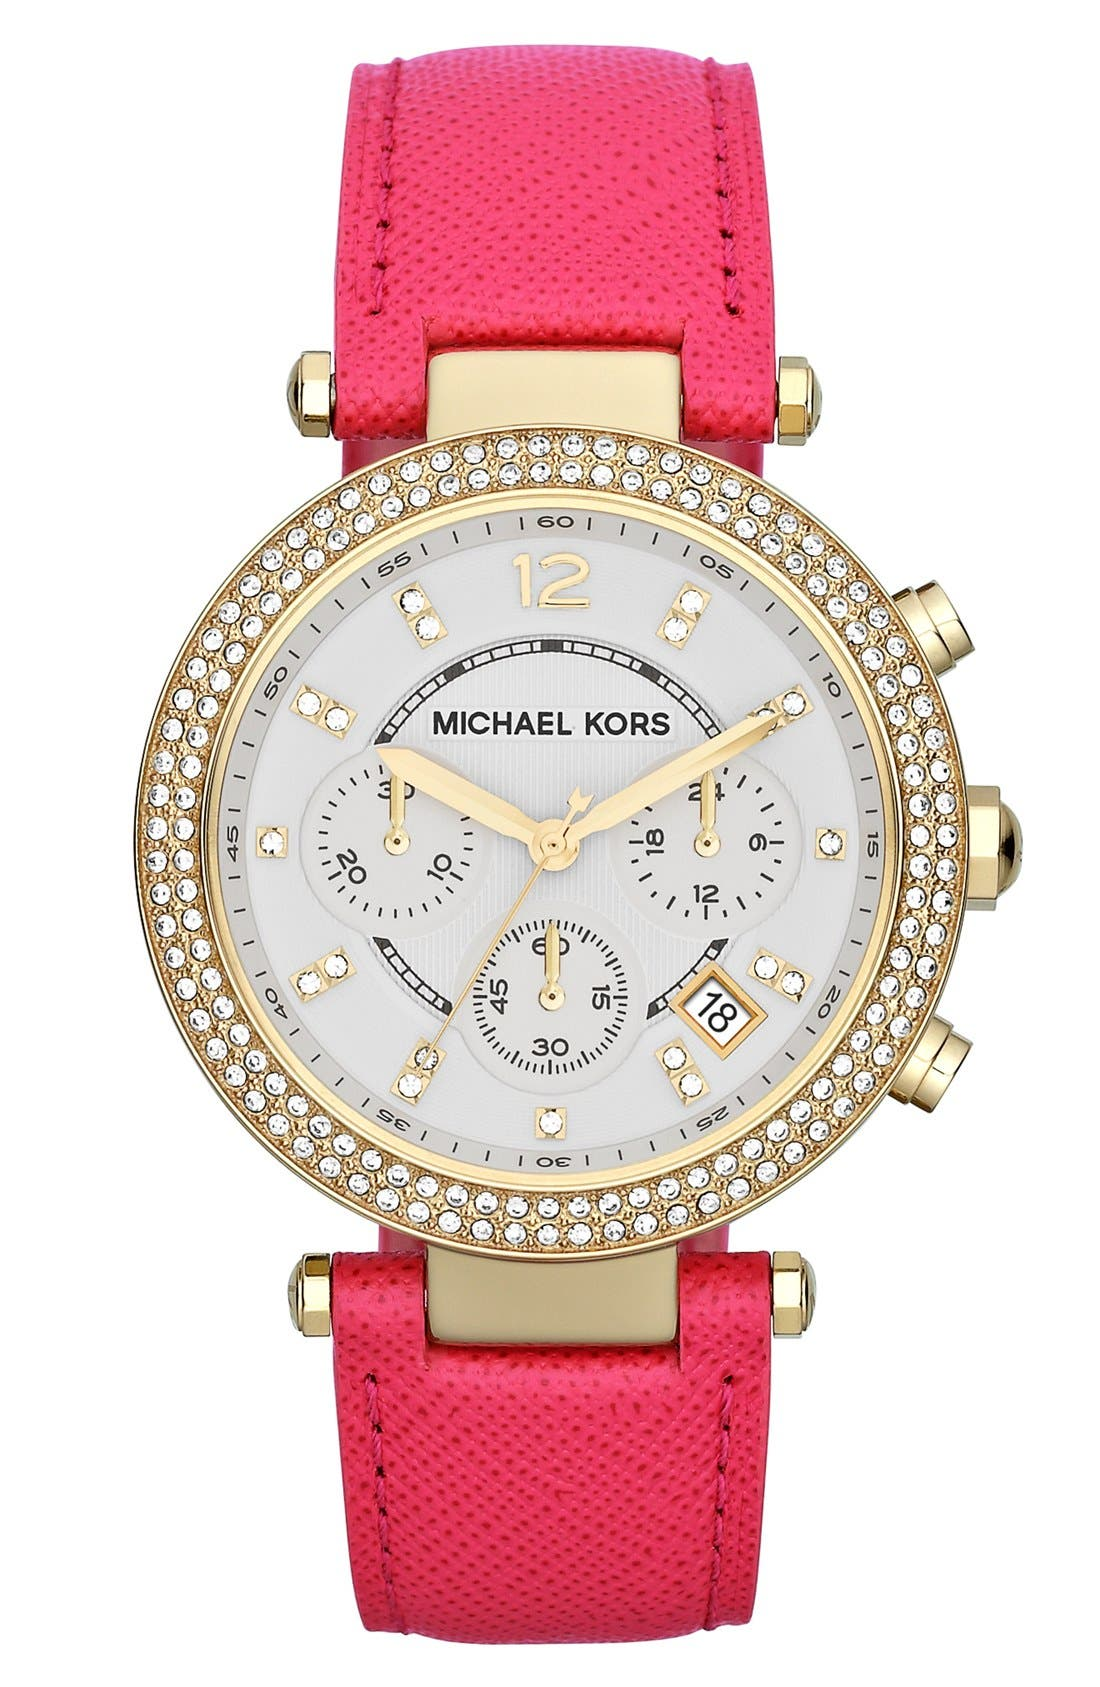 Main Image - Michael Kors 'Parker' Chronograph Leather Watch, 39mm